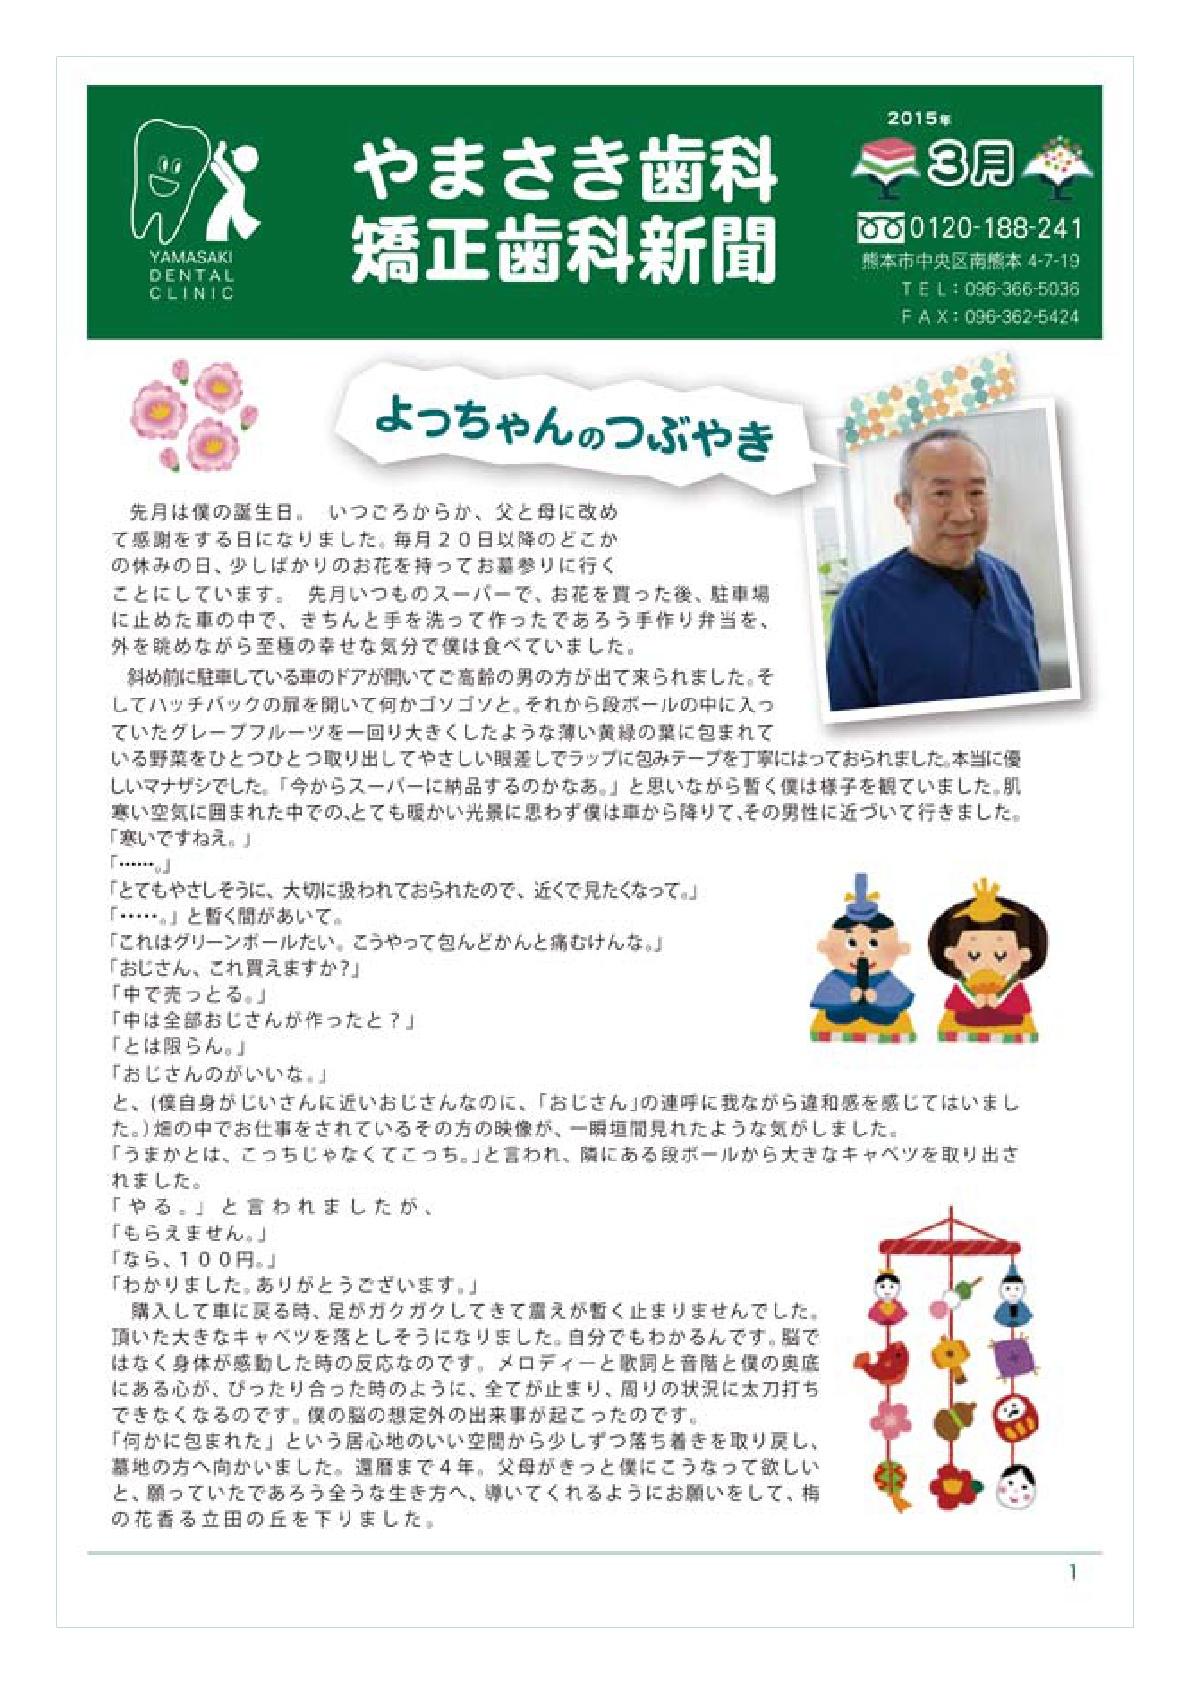 sinbun15-3-1-001